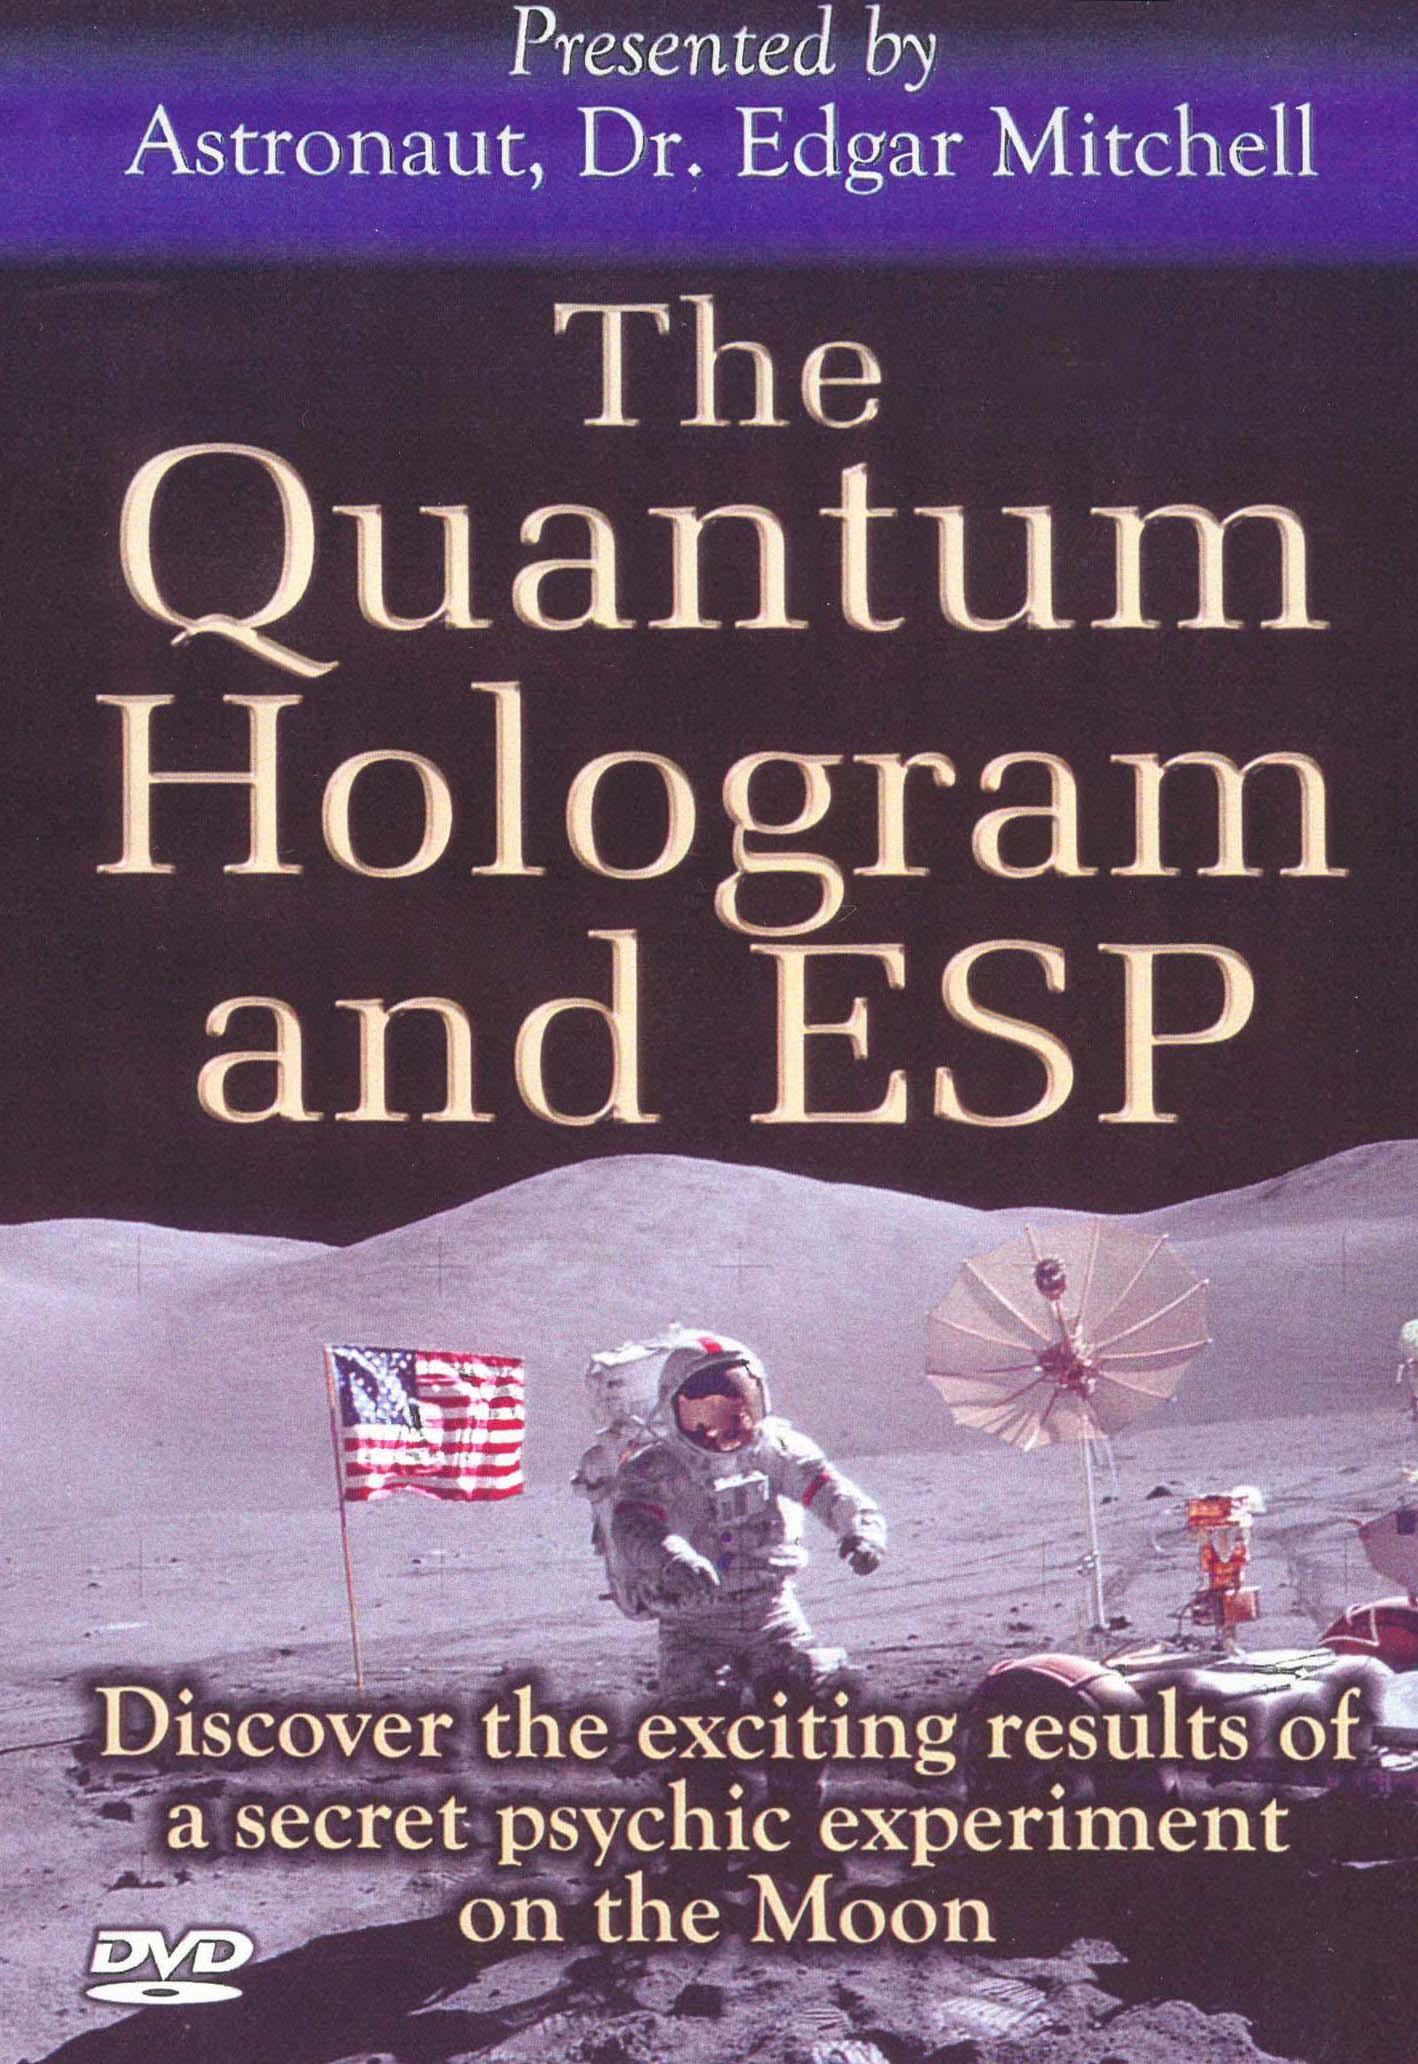 The Quantum Hologram and ESP